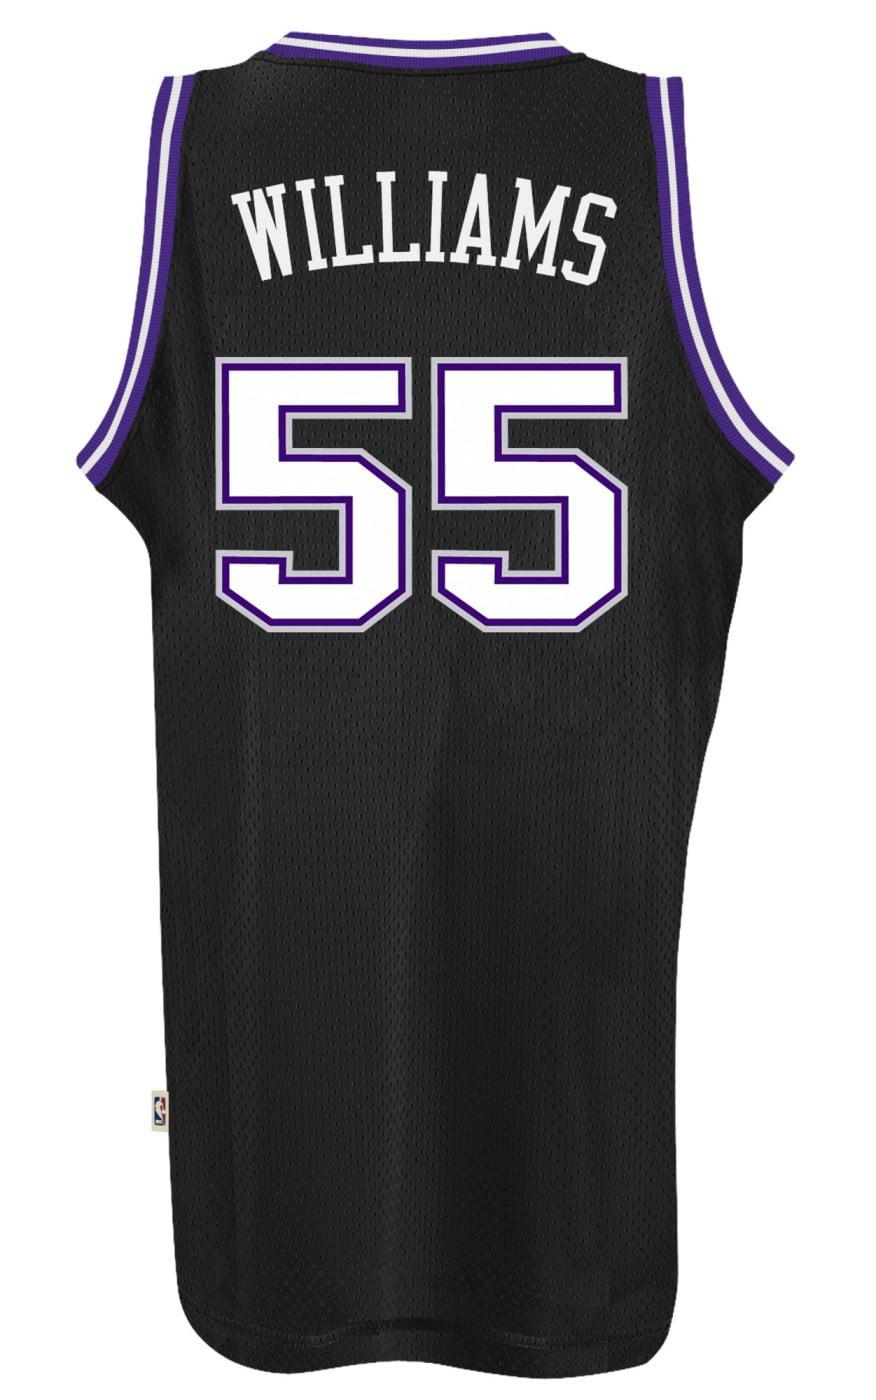 6a89ea343 Jason Williams Sacramento Kings Adidas NBA Throwback Swingman Jersey -  Black - Walmart.com